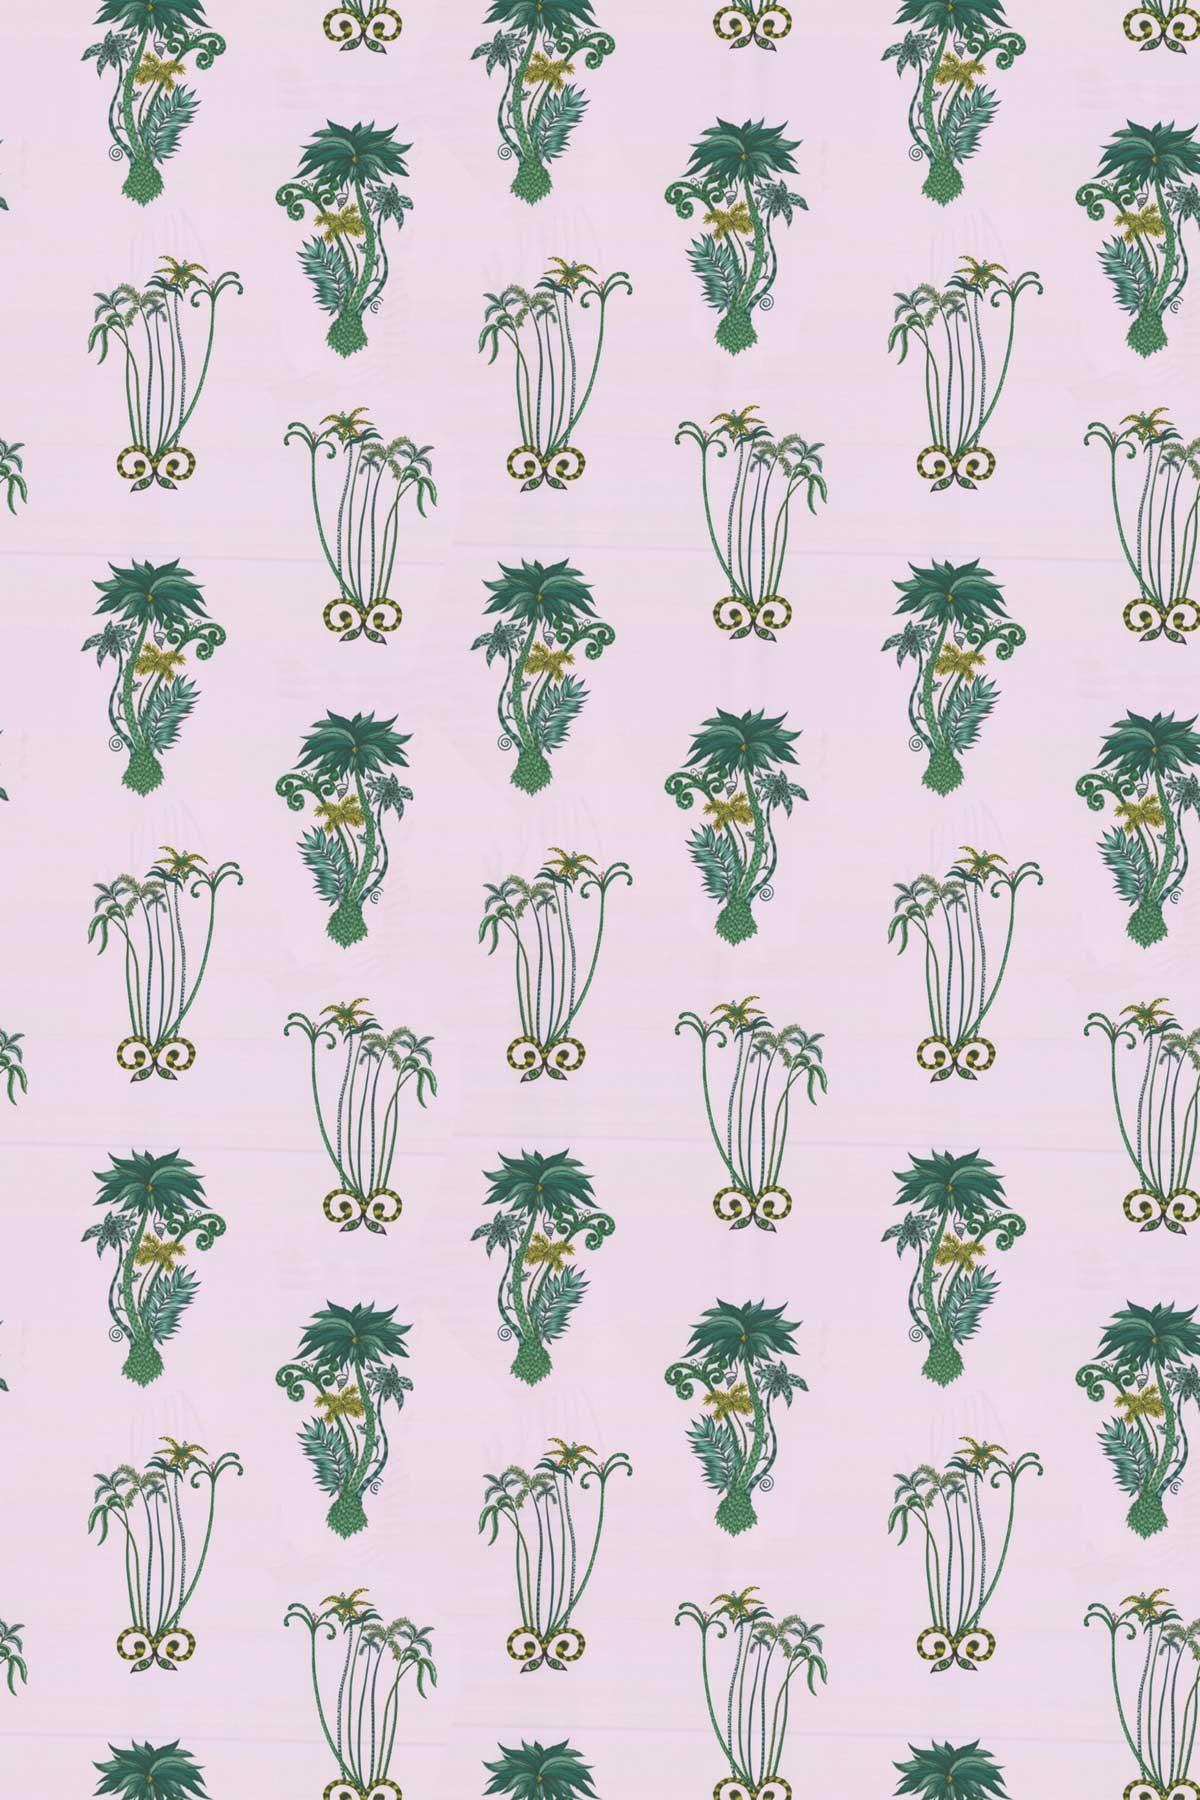 Emma J Shipley Jungle Palms Pink Fabric - Product code: F1110/04